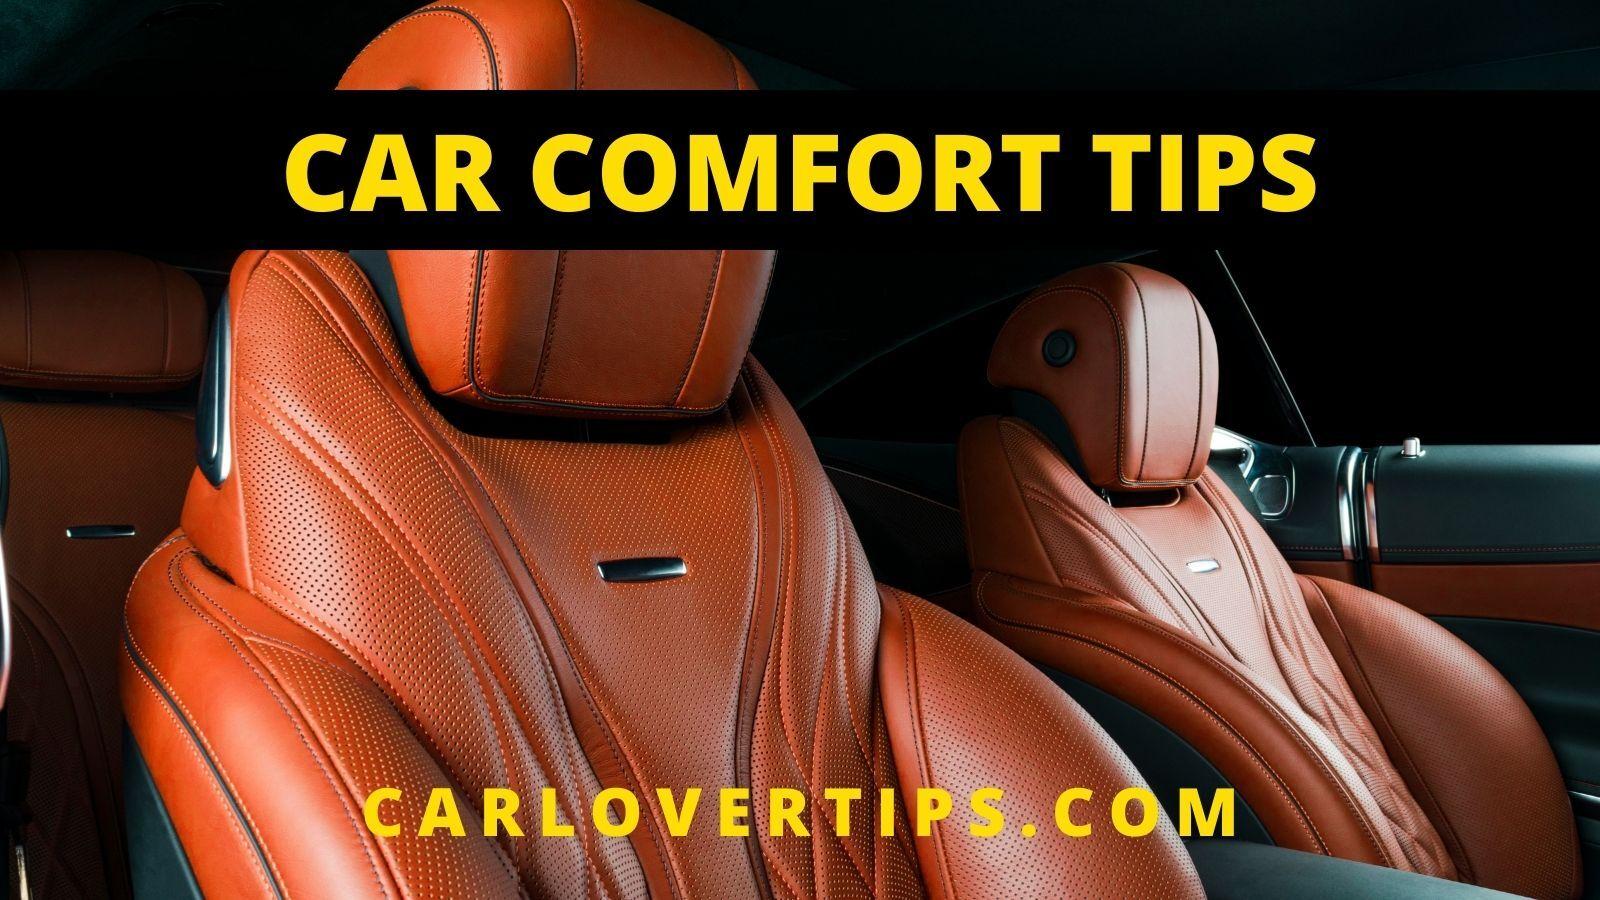 Car Comfort Tips Car Lover Tips